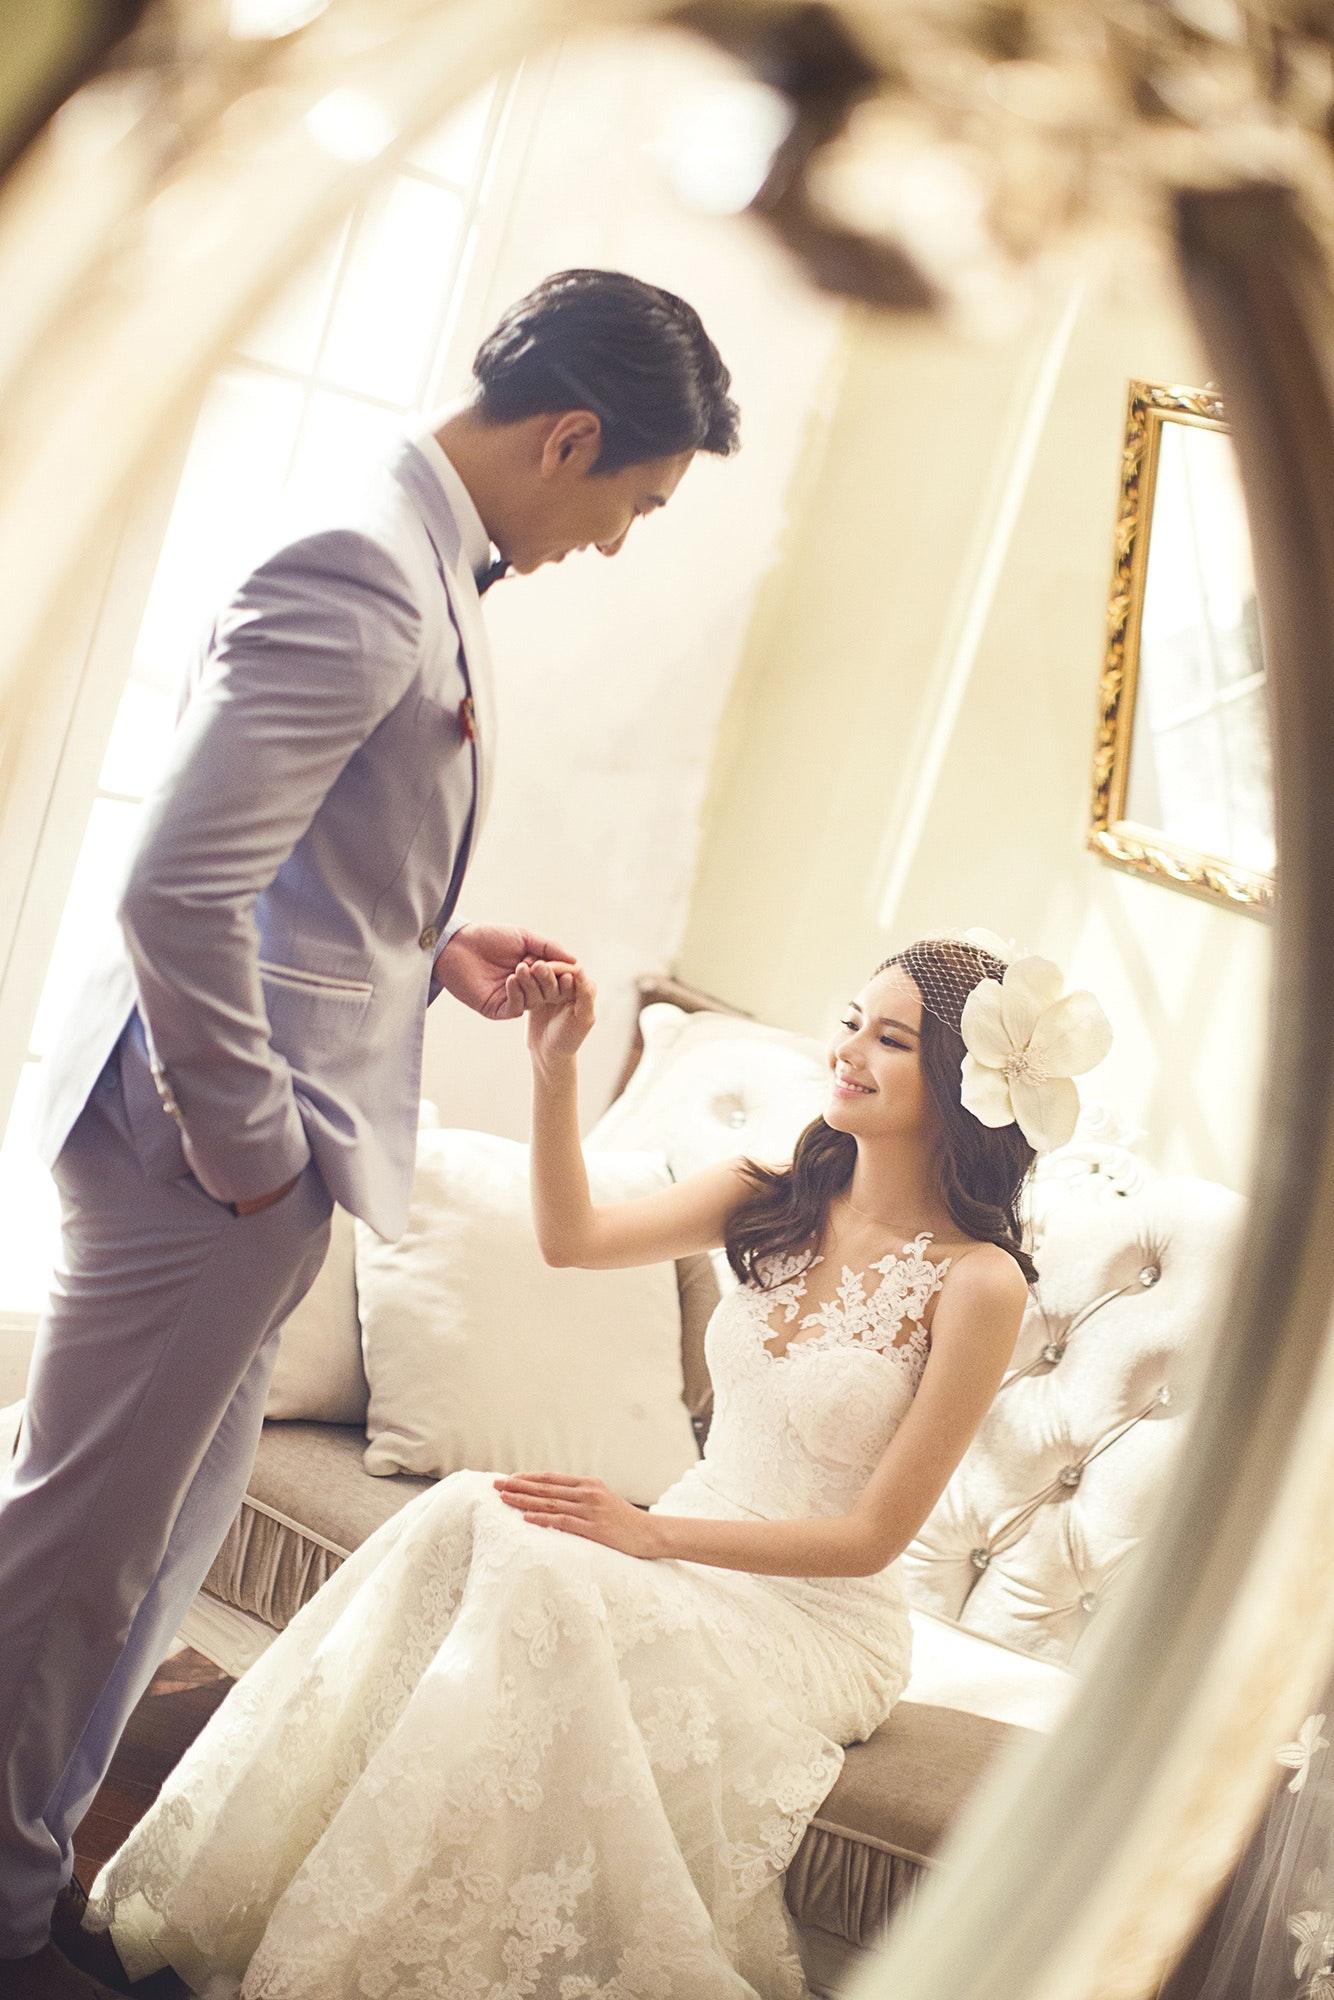 adult-bridal-bride-265854